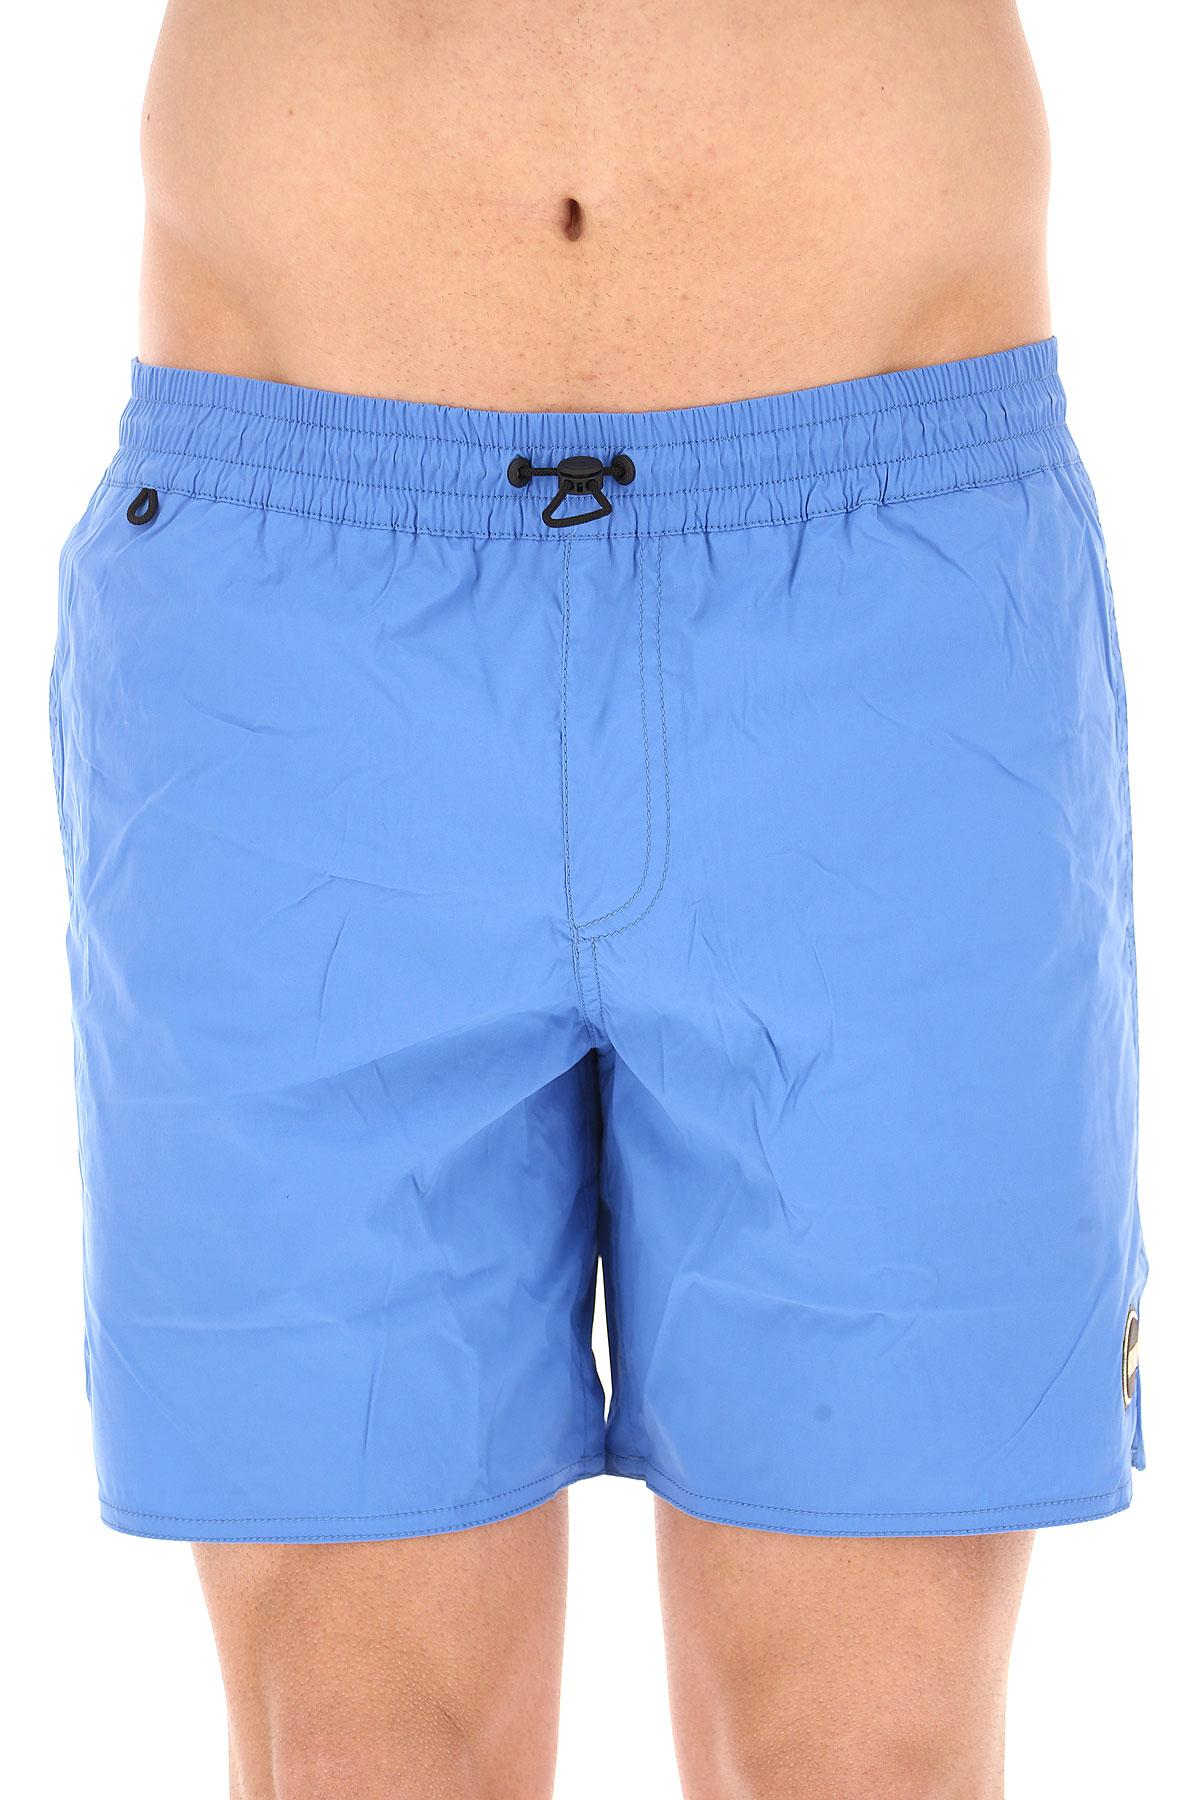 Image of Colmar Swim Shorts Trunks for Men On Sale, Sky Blue, polyamide, 2017, L (EU 50) XL (EU 52)